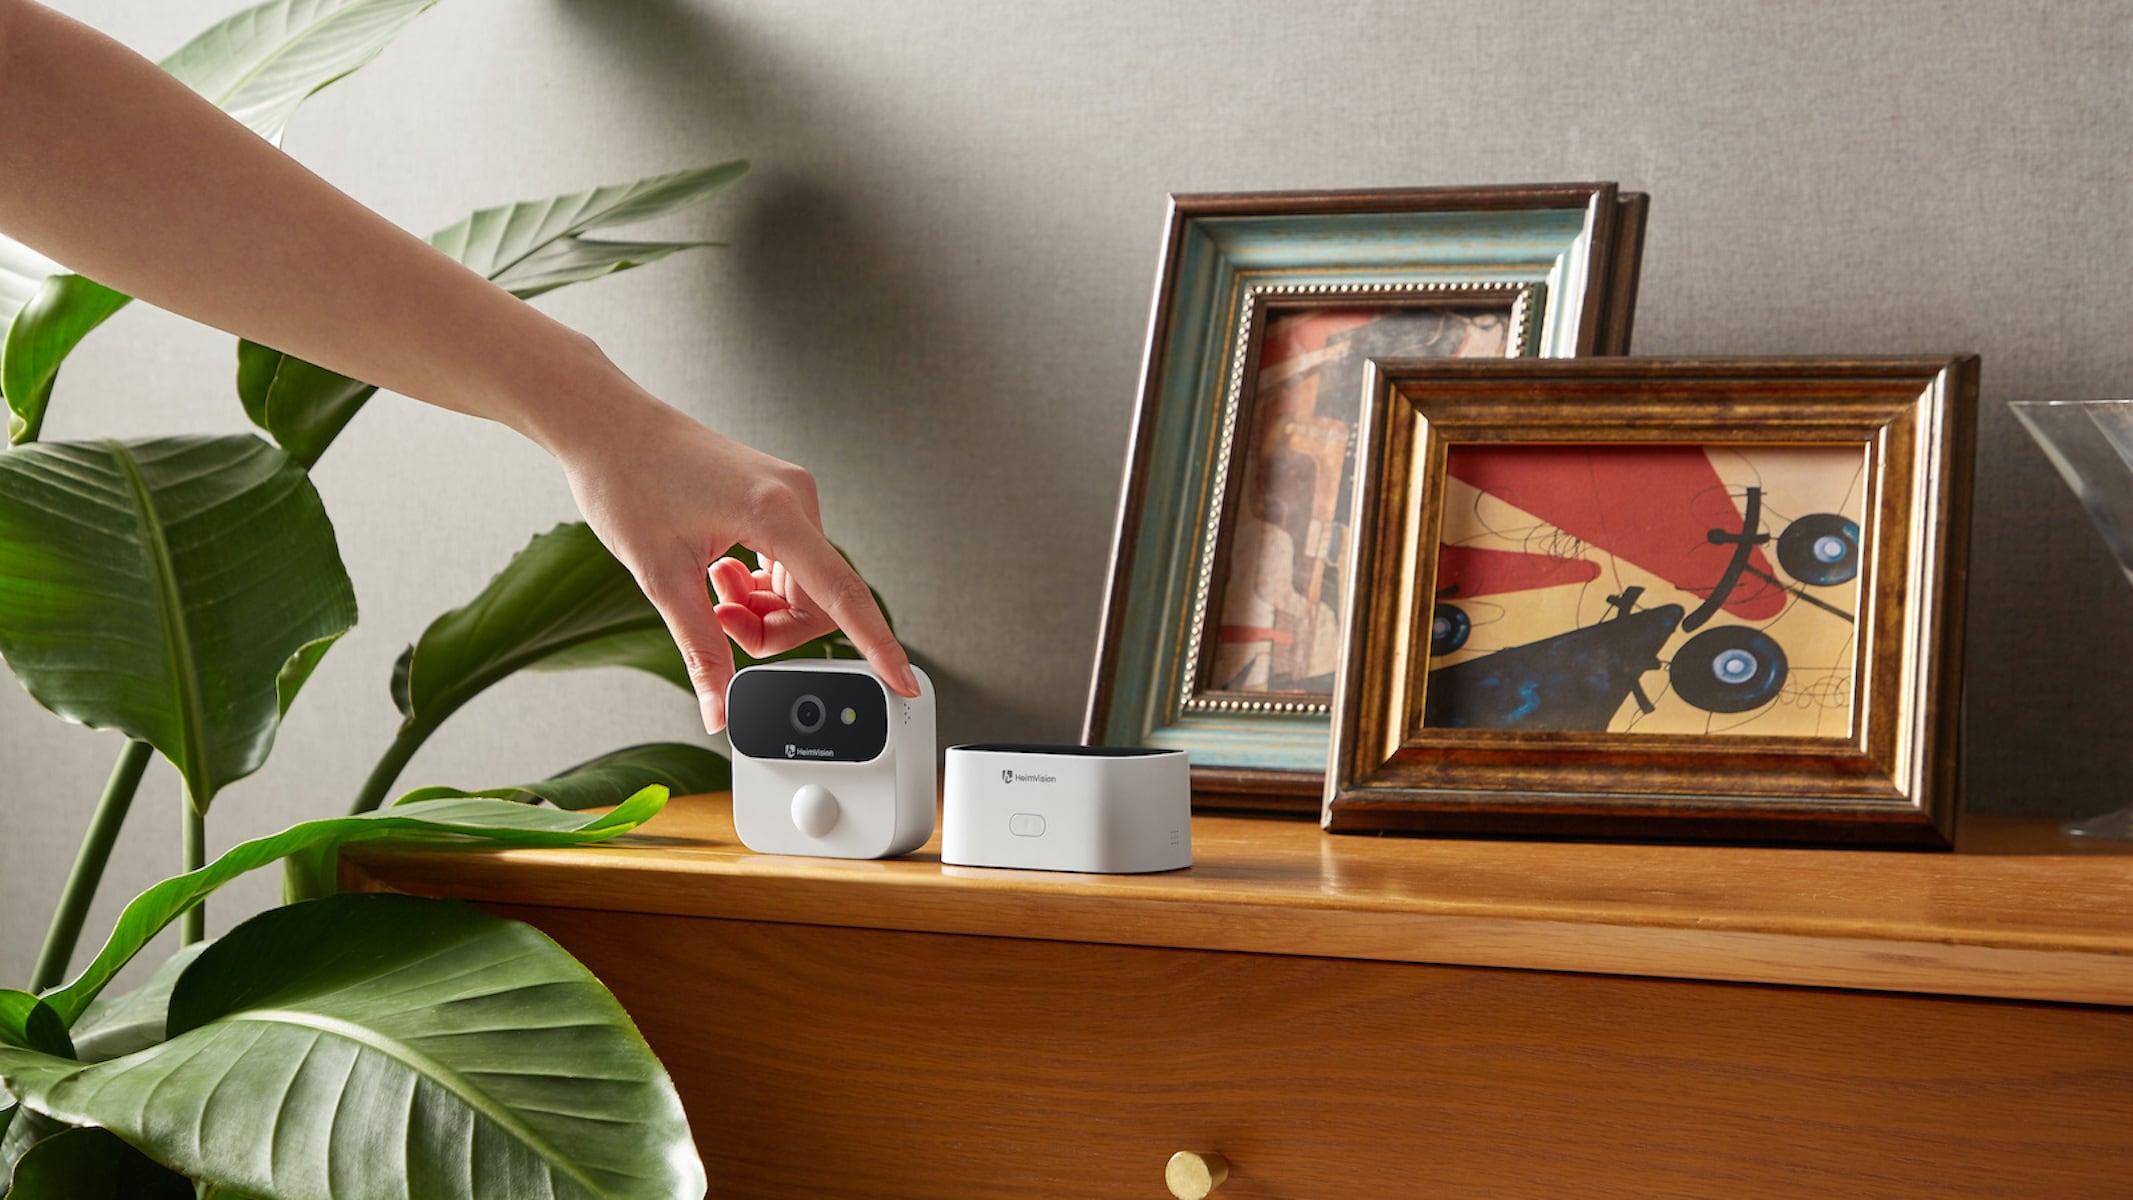 Must-buy Amazon Alexa gadgets